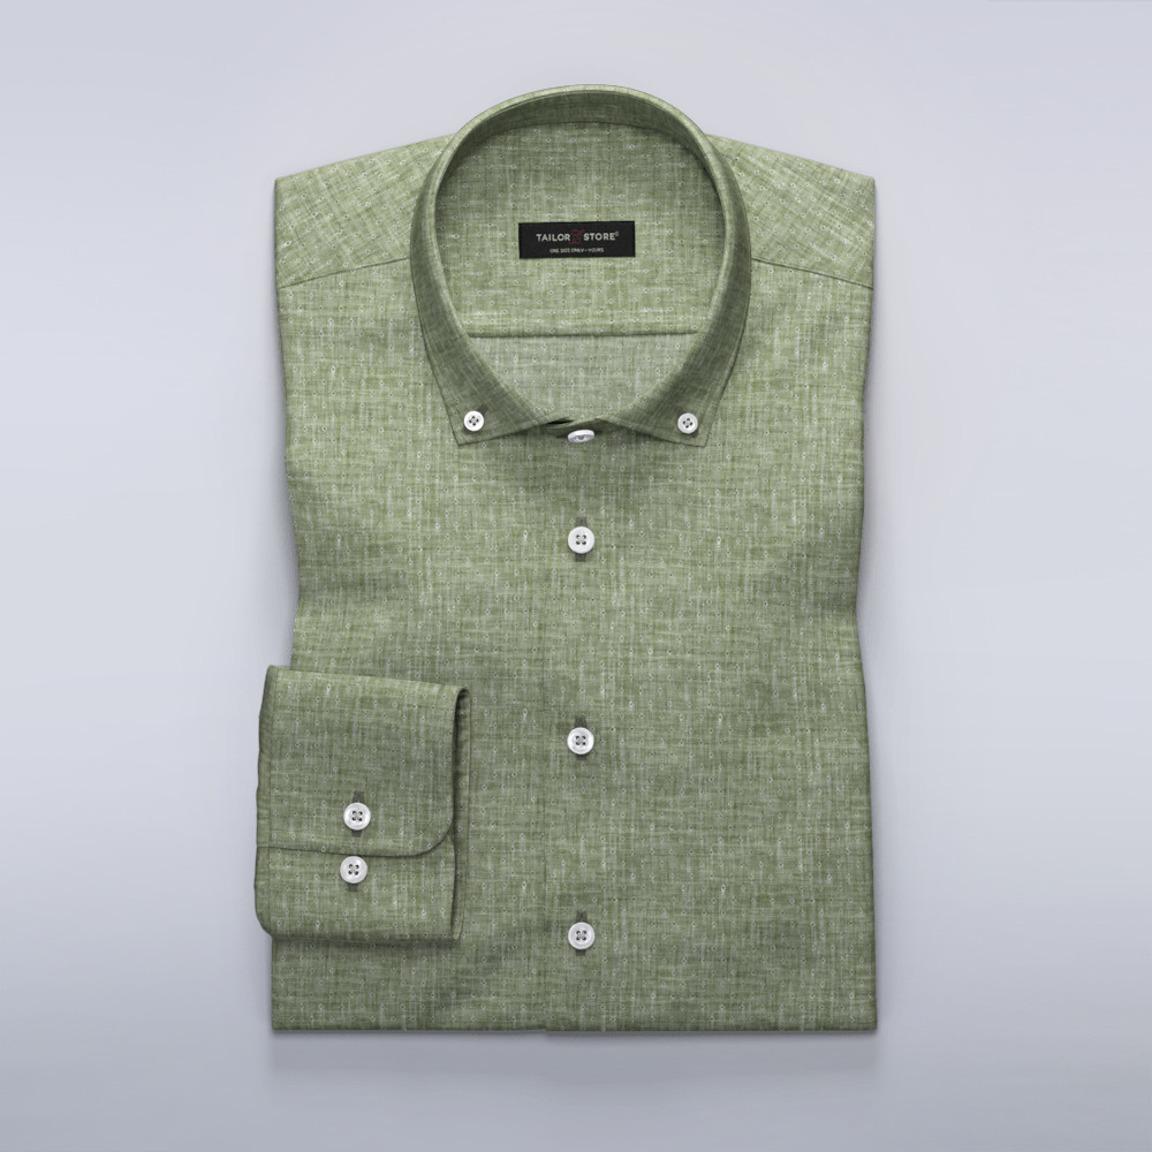 Dames overhemd in groen linnen